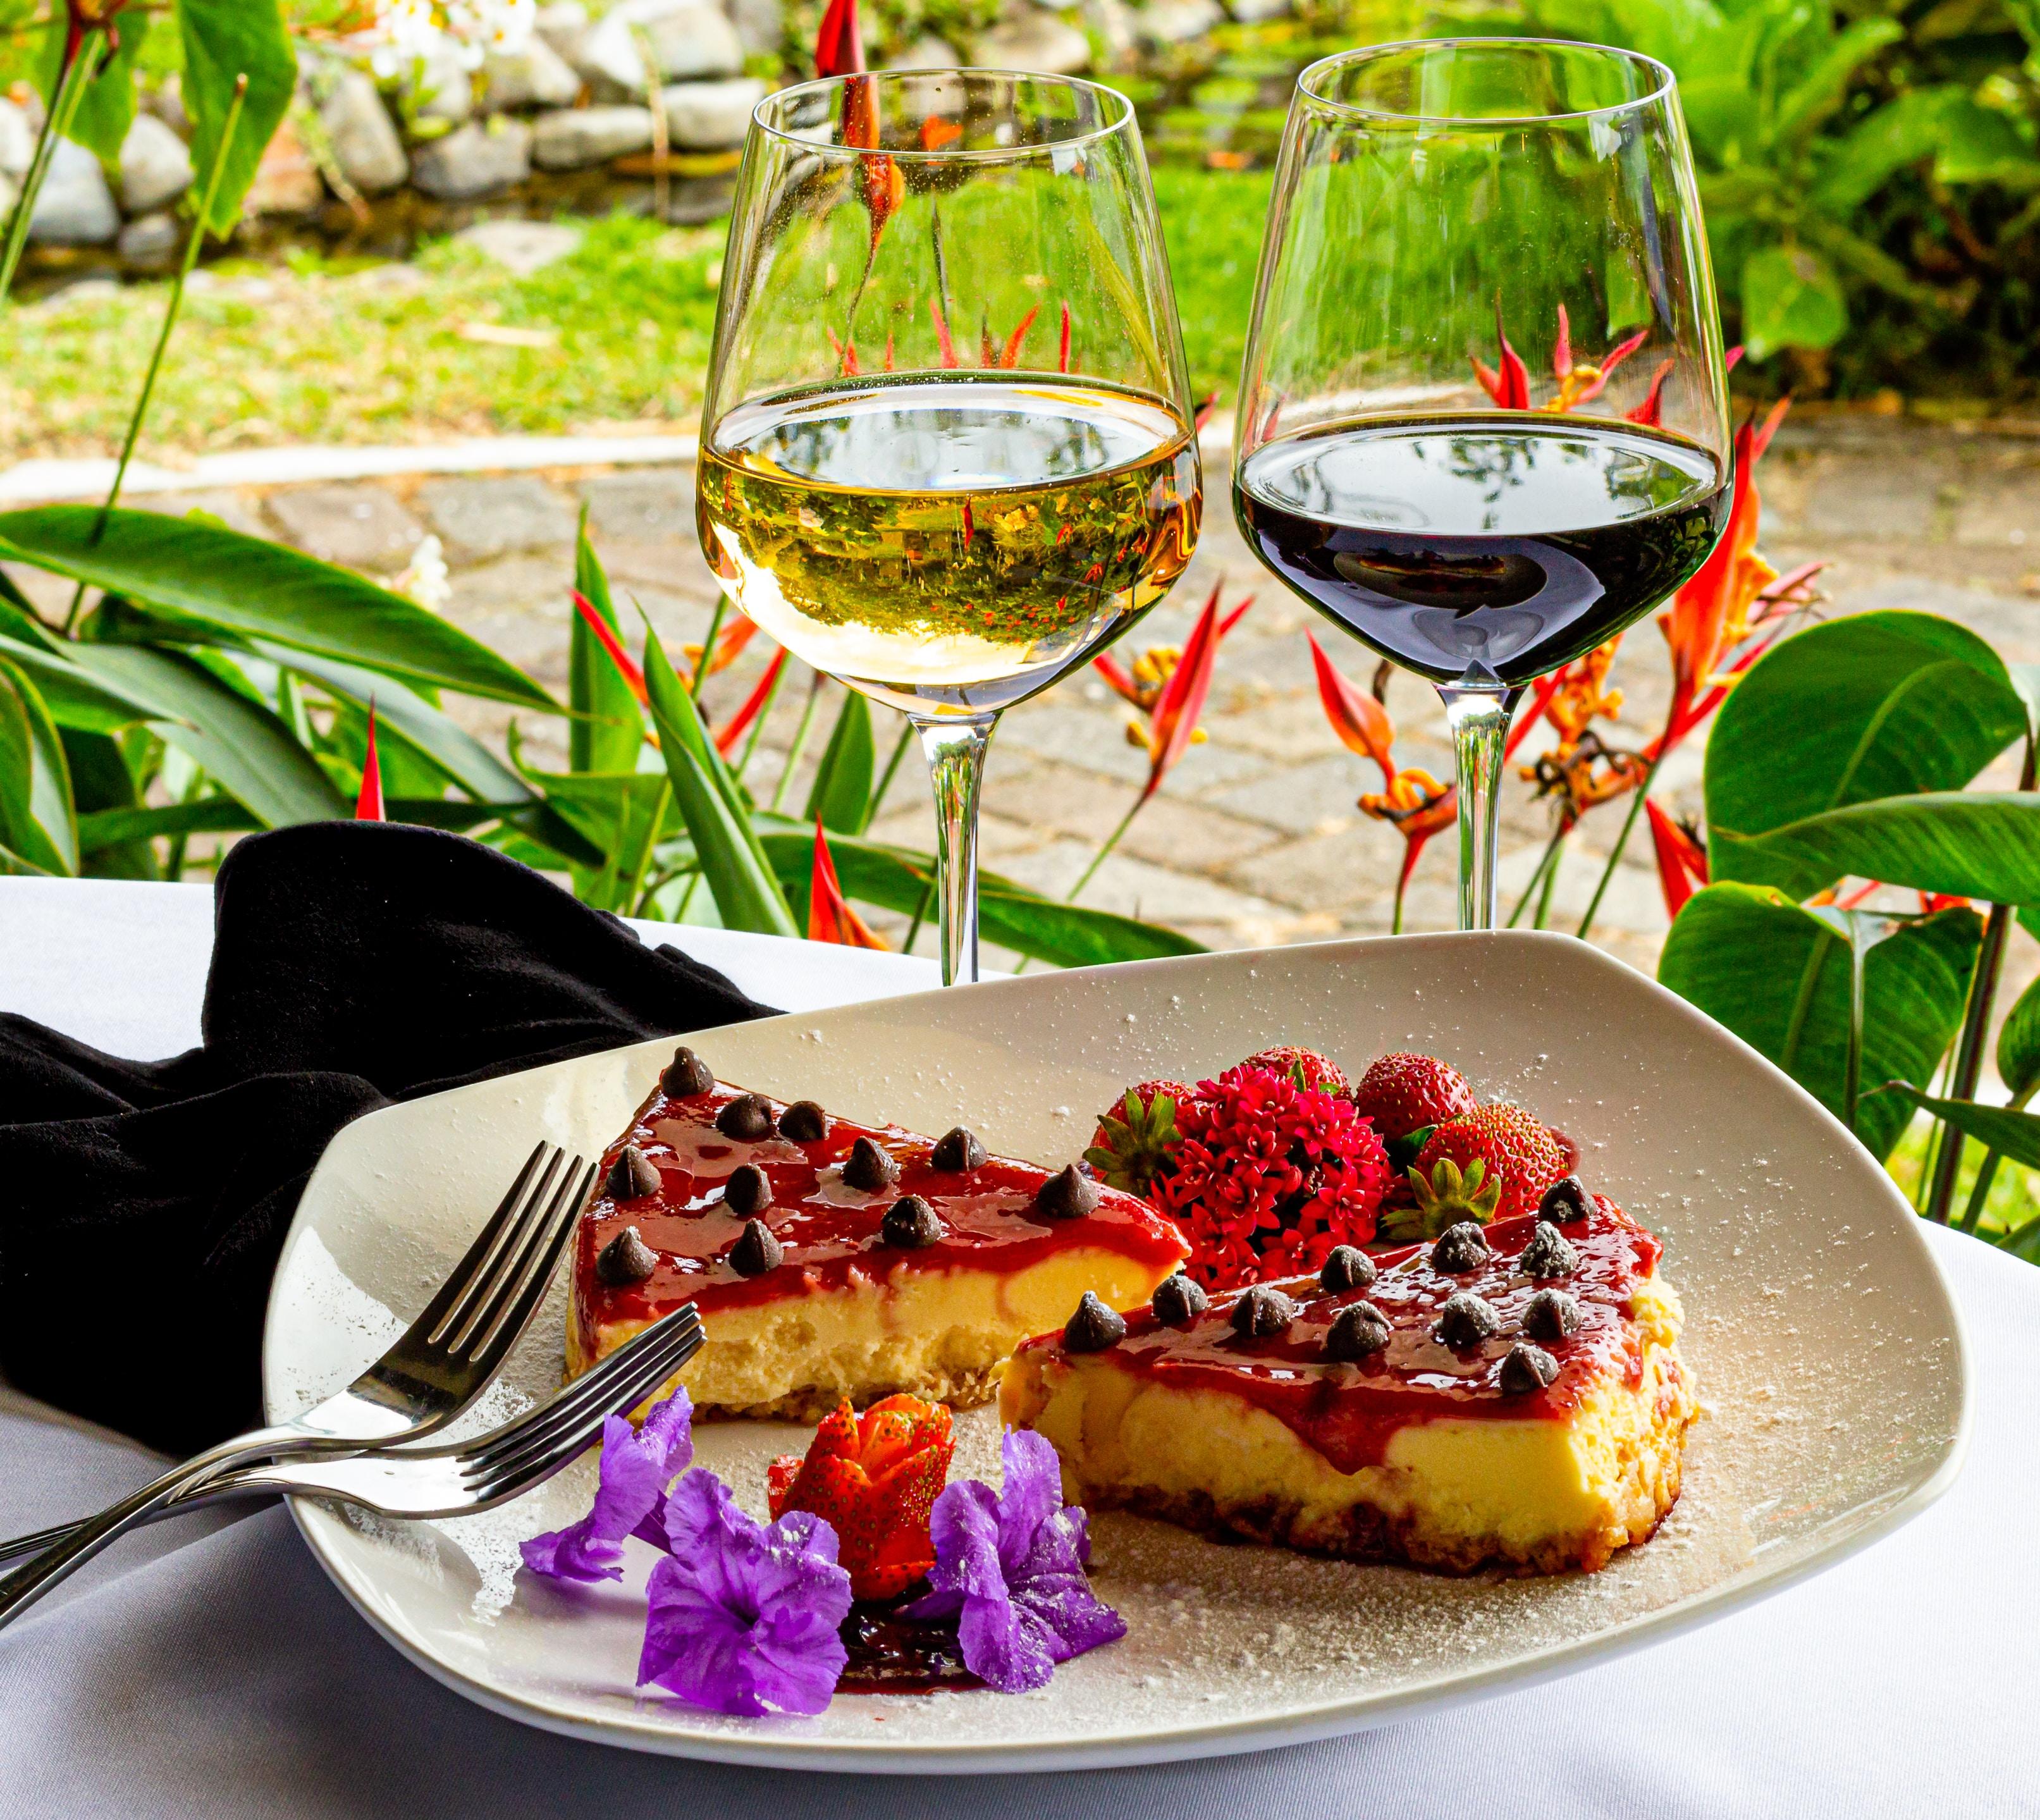 sweetness in the wine